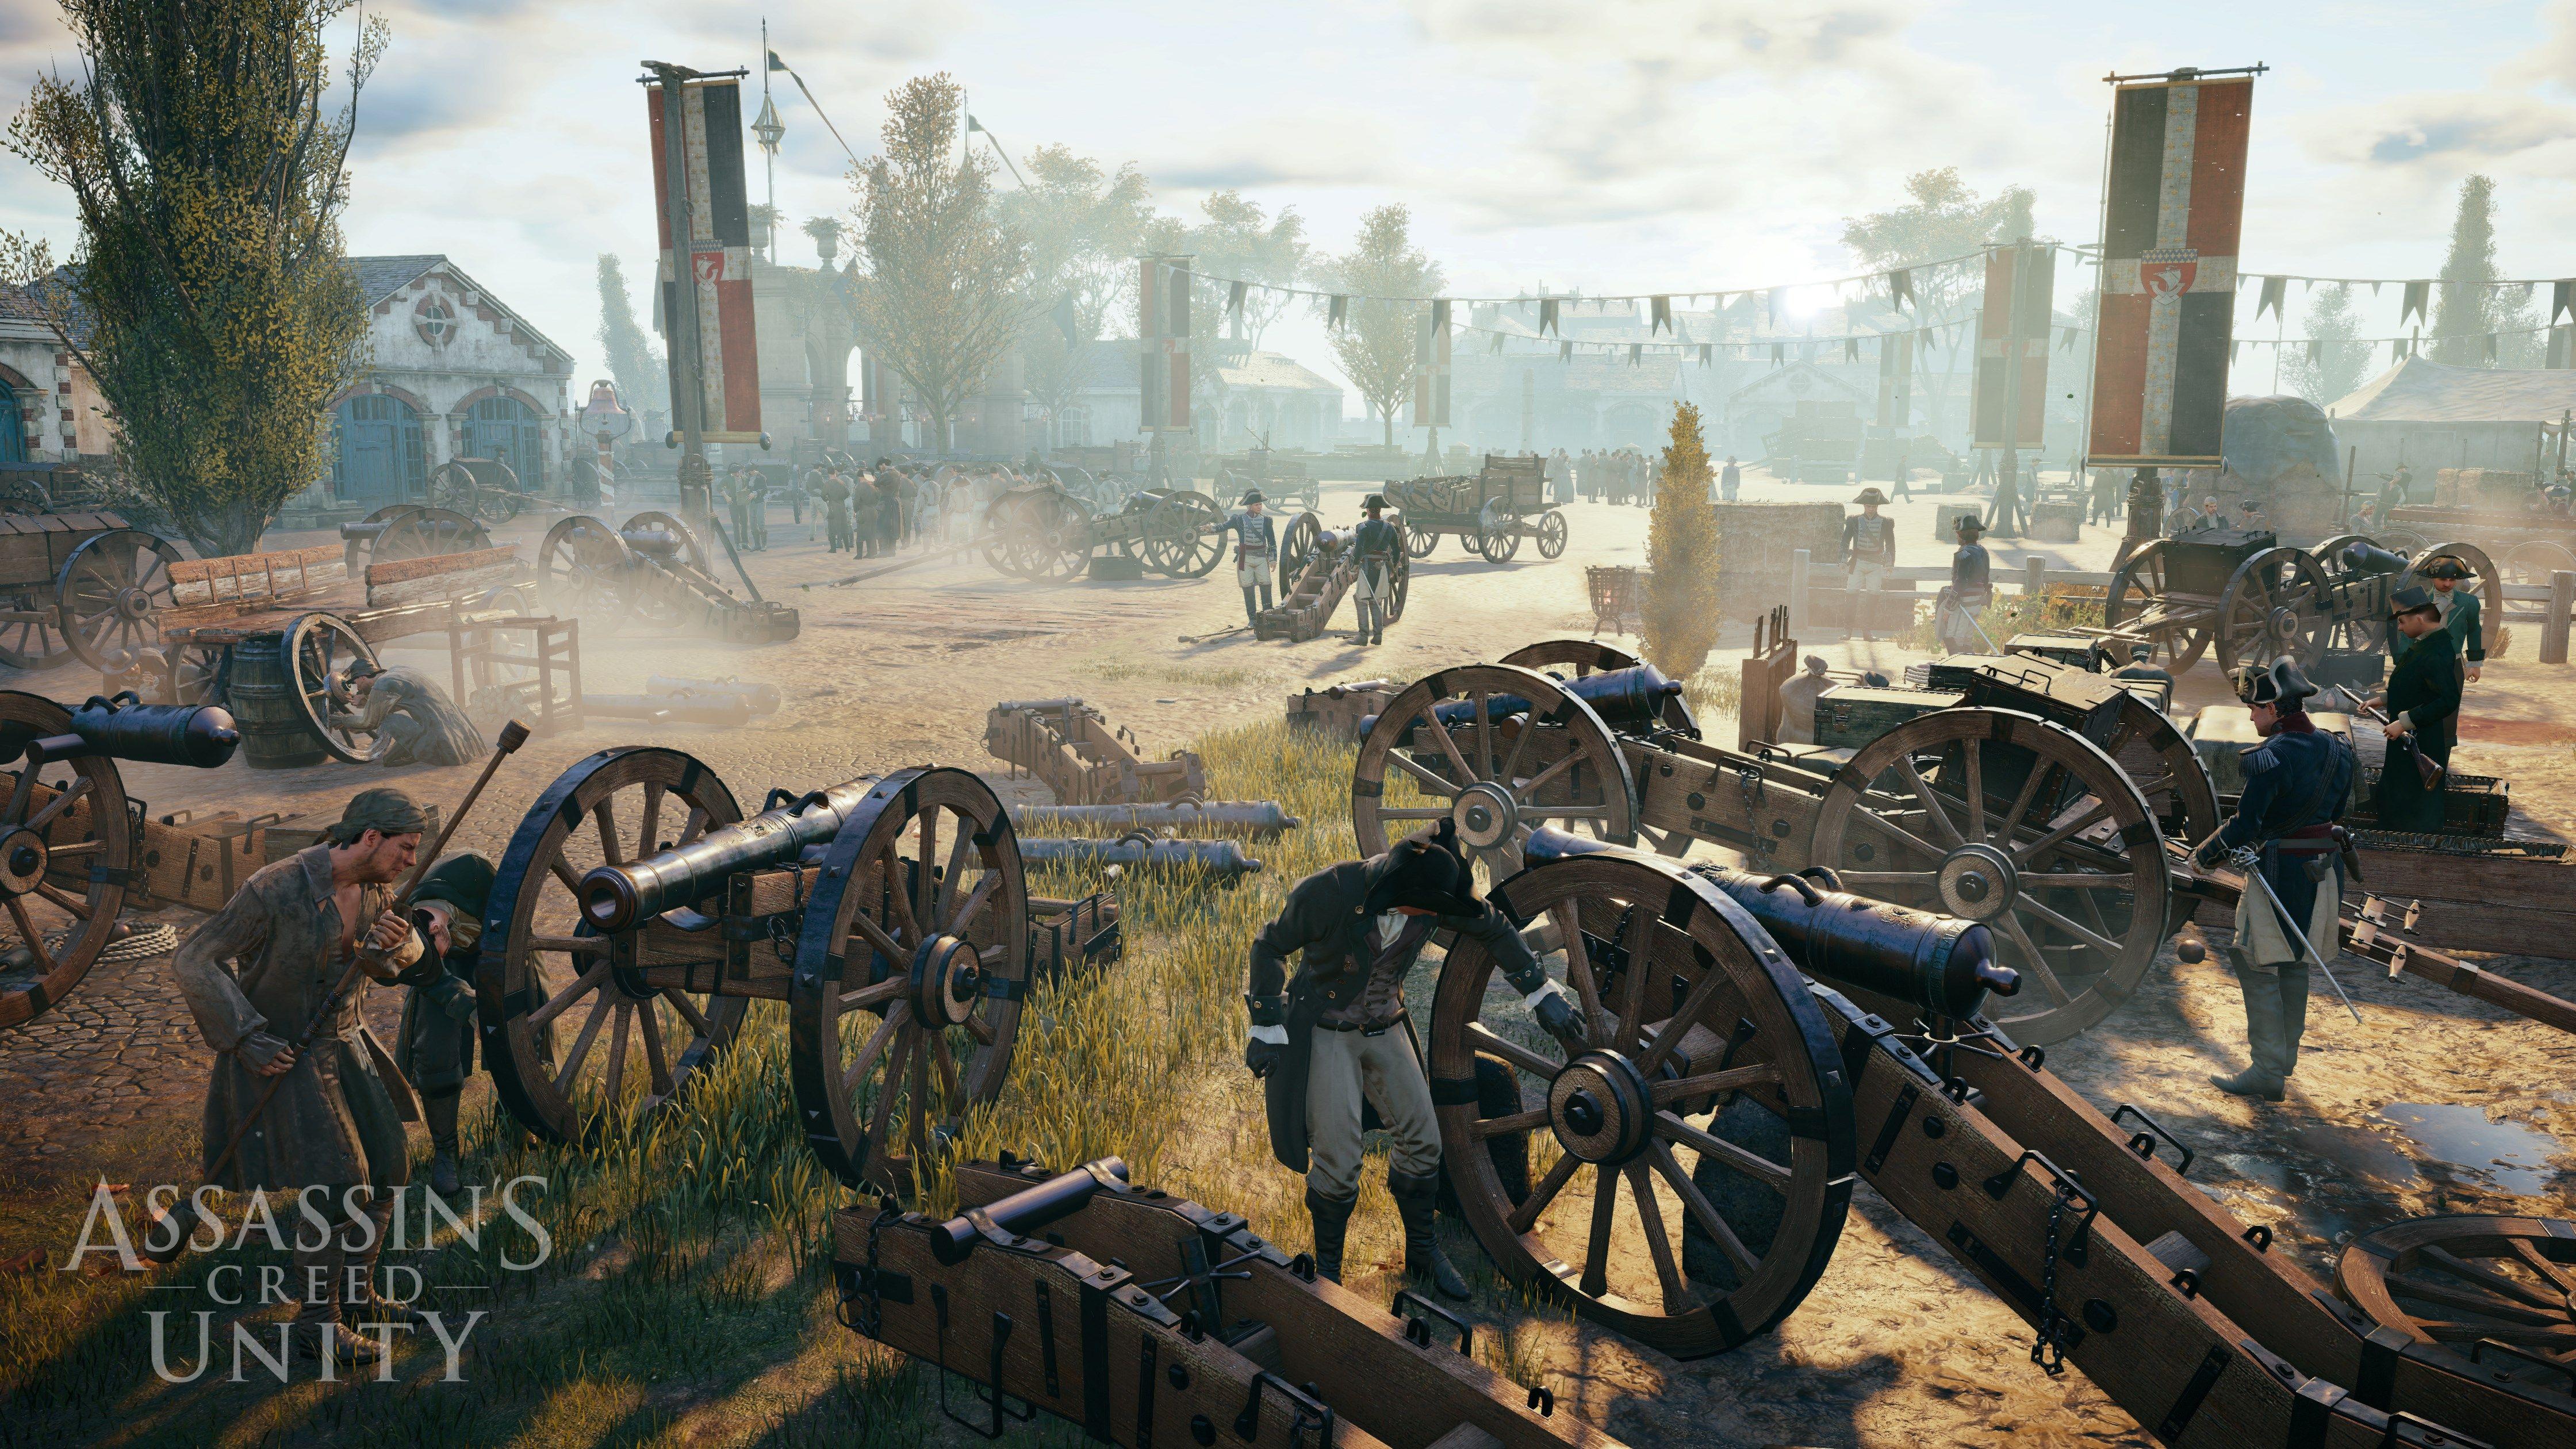 HQ Definition Wallpaper Desktop Assassins Creed Unity By Thorndike Little 2017 03